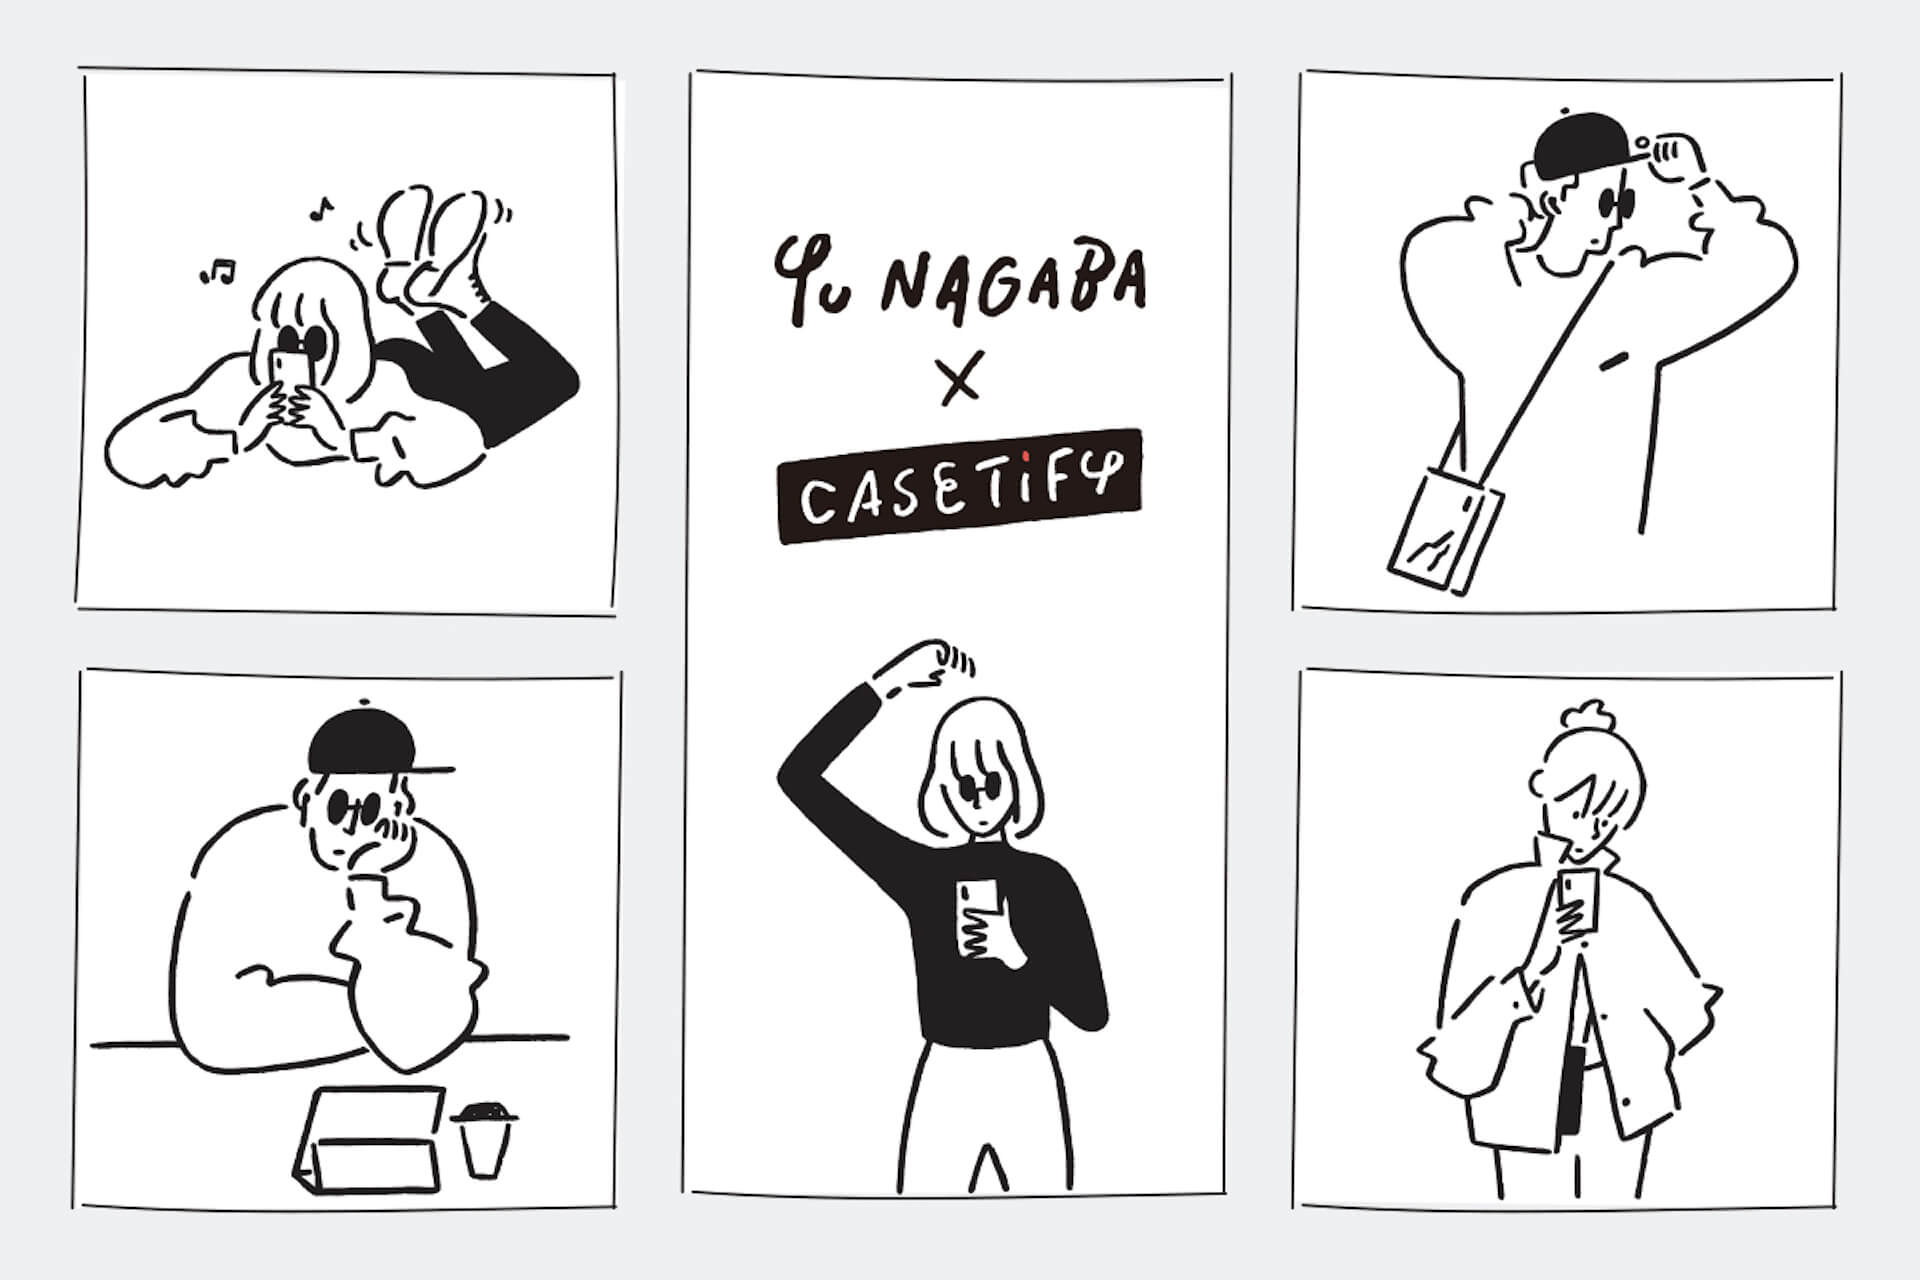 CASETiFYから「Yu Nagaba × CASETiFYコレクション」が登場!描き下ろし手描きフォントのケースや限定アートピース販売も ac200618_castify_yunagaba_02